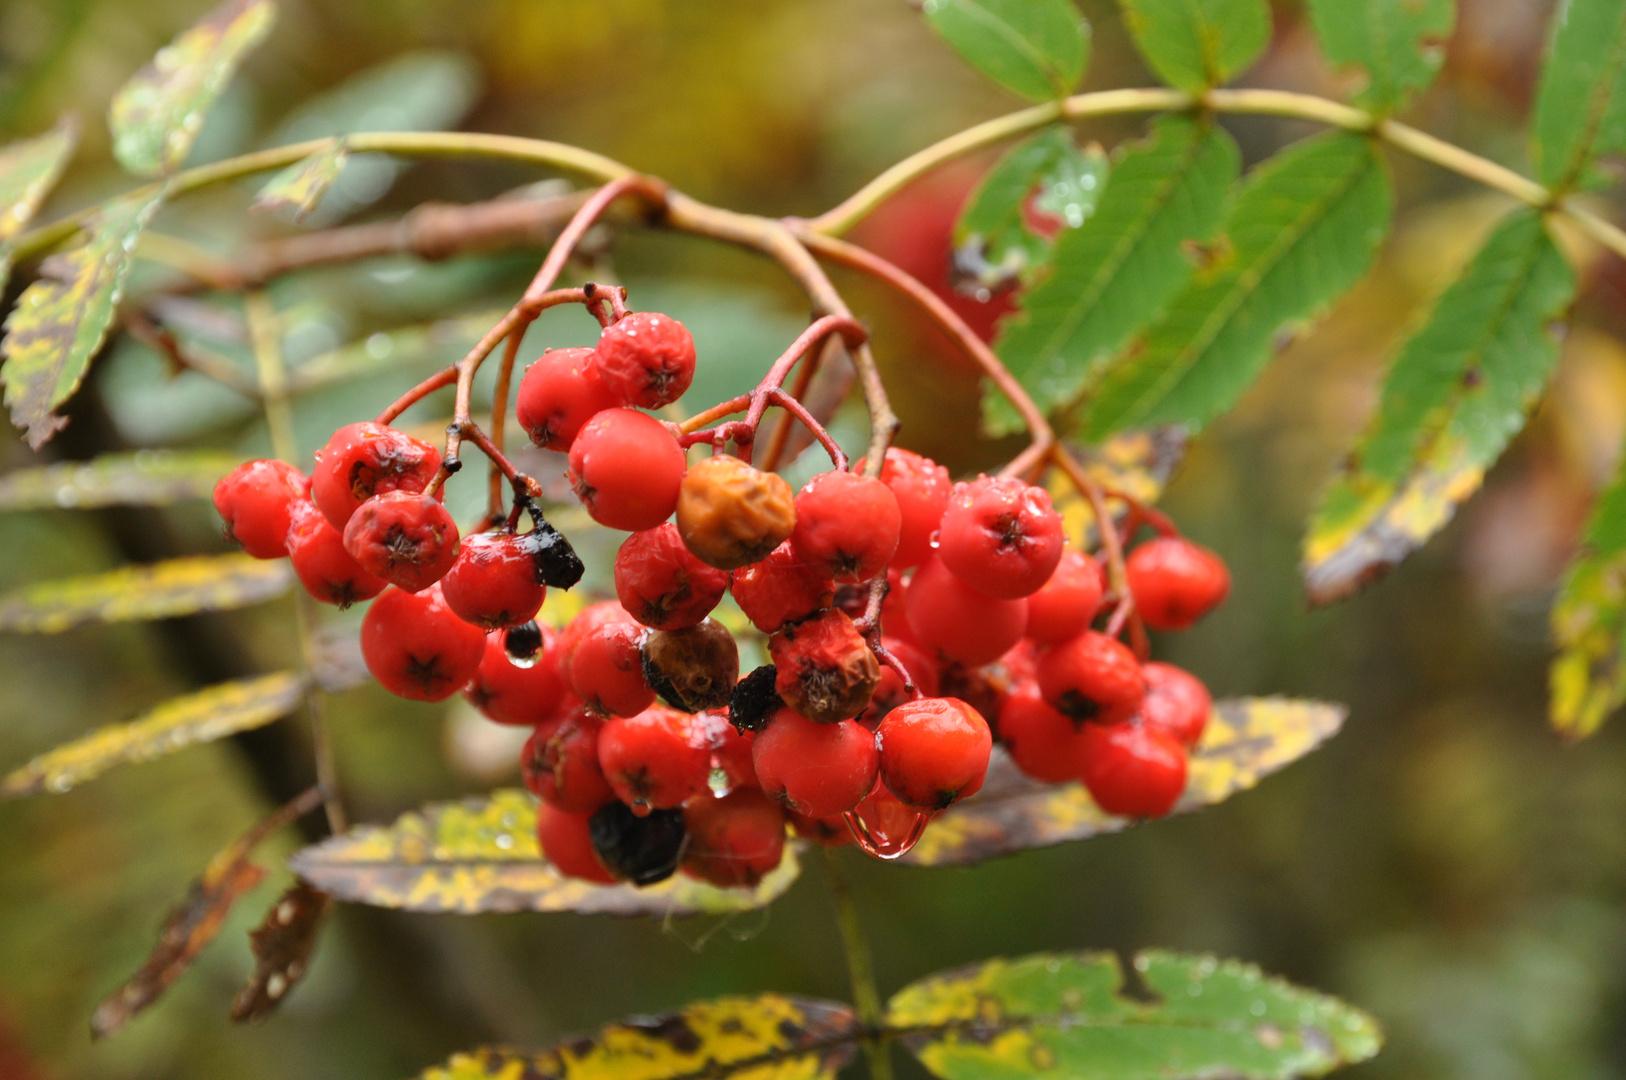 Rote Beeren der Eberesche mit Regentropfen